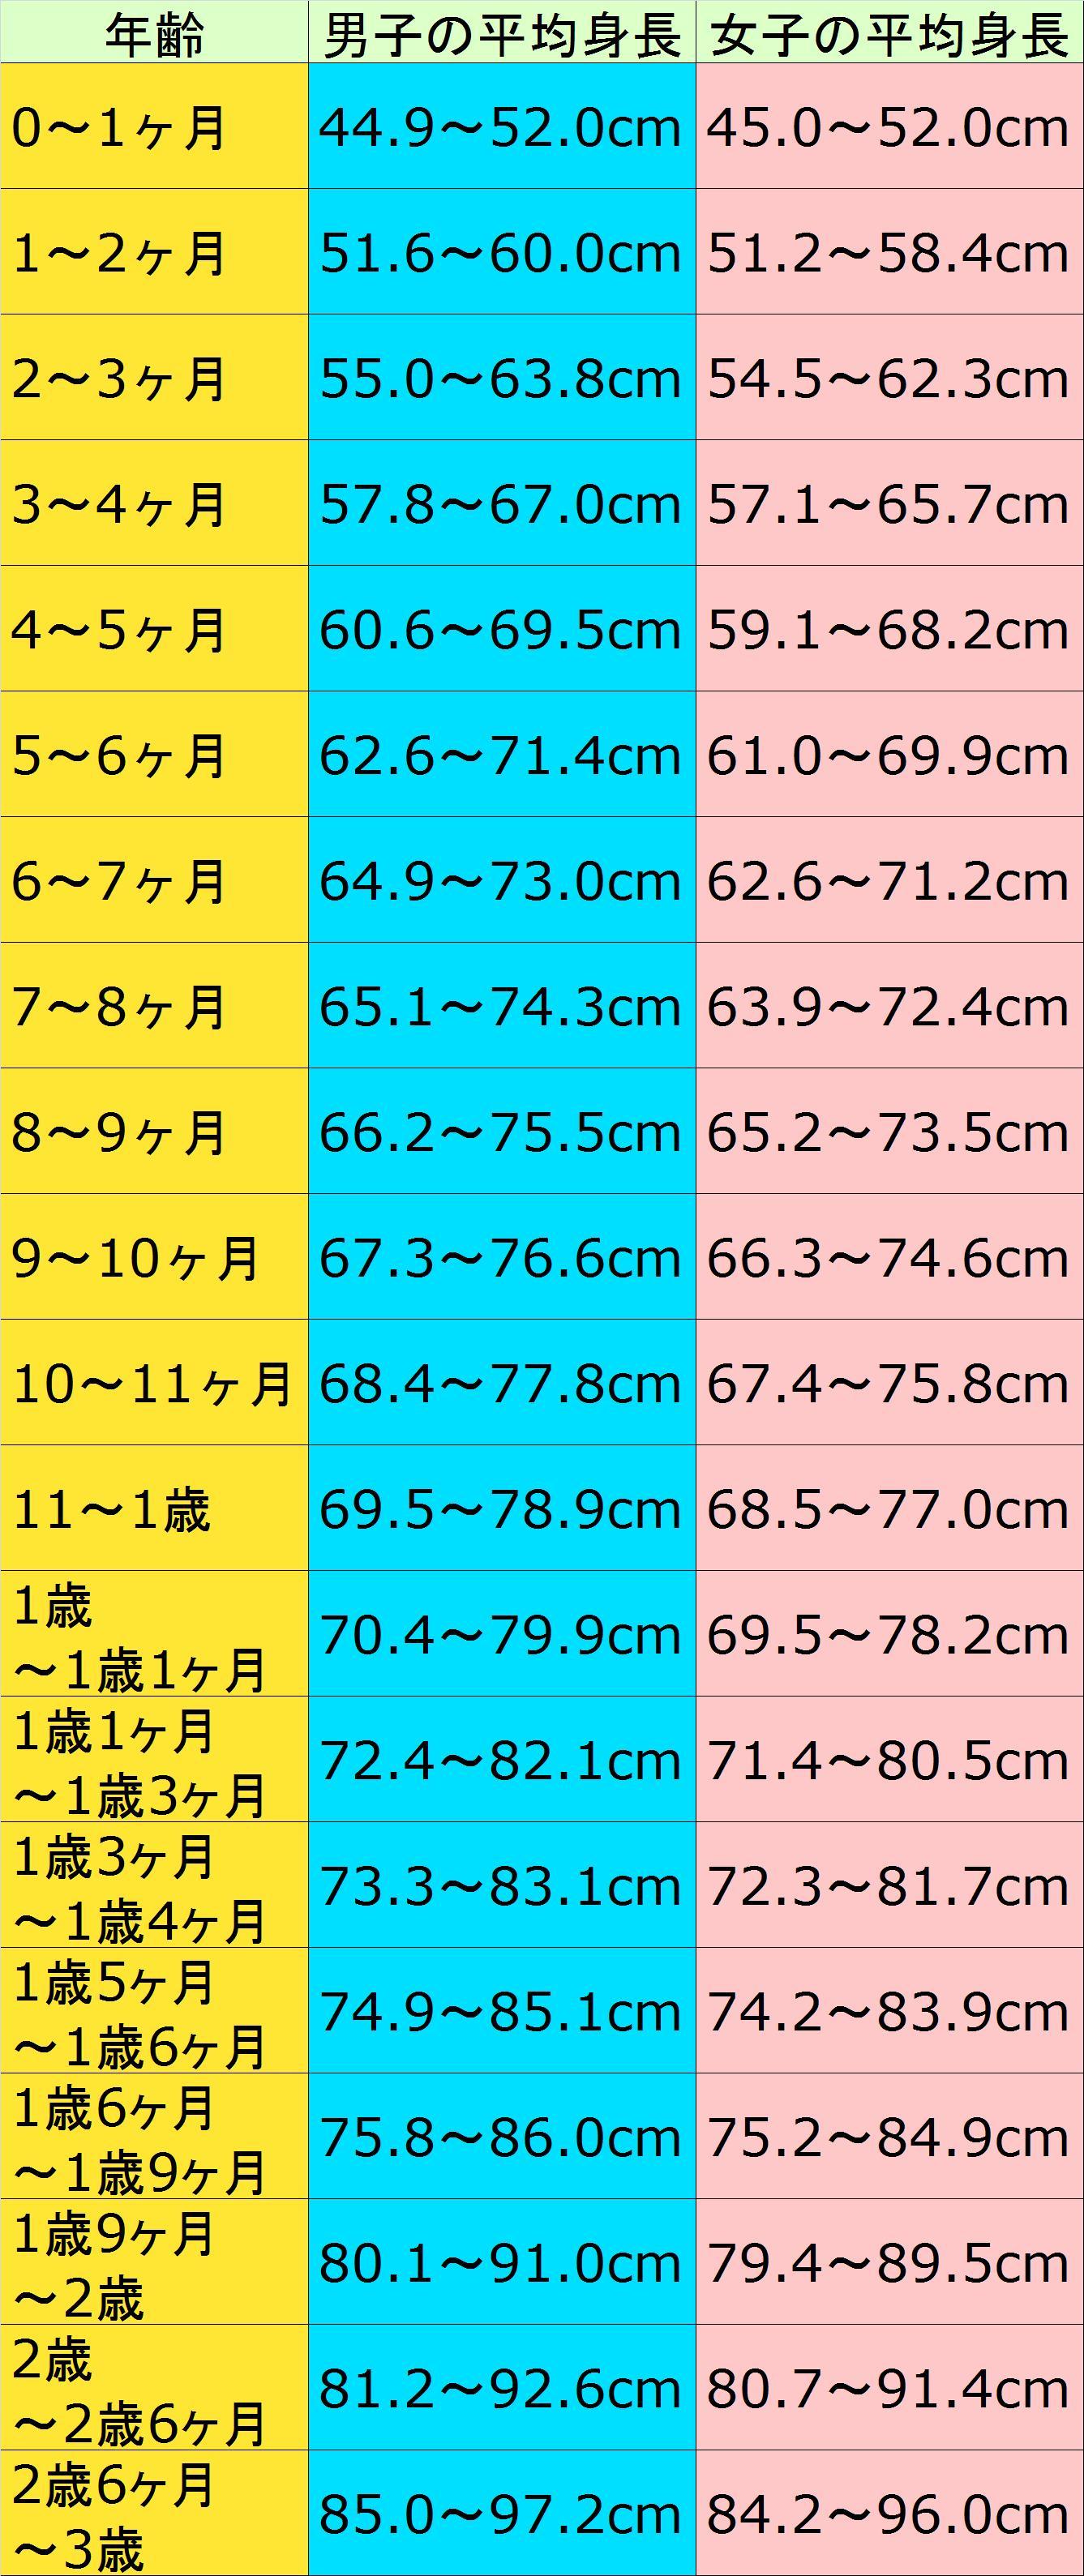 2 歳児 平均 体重